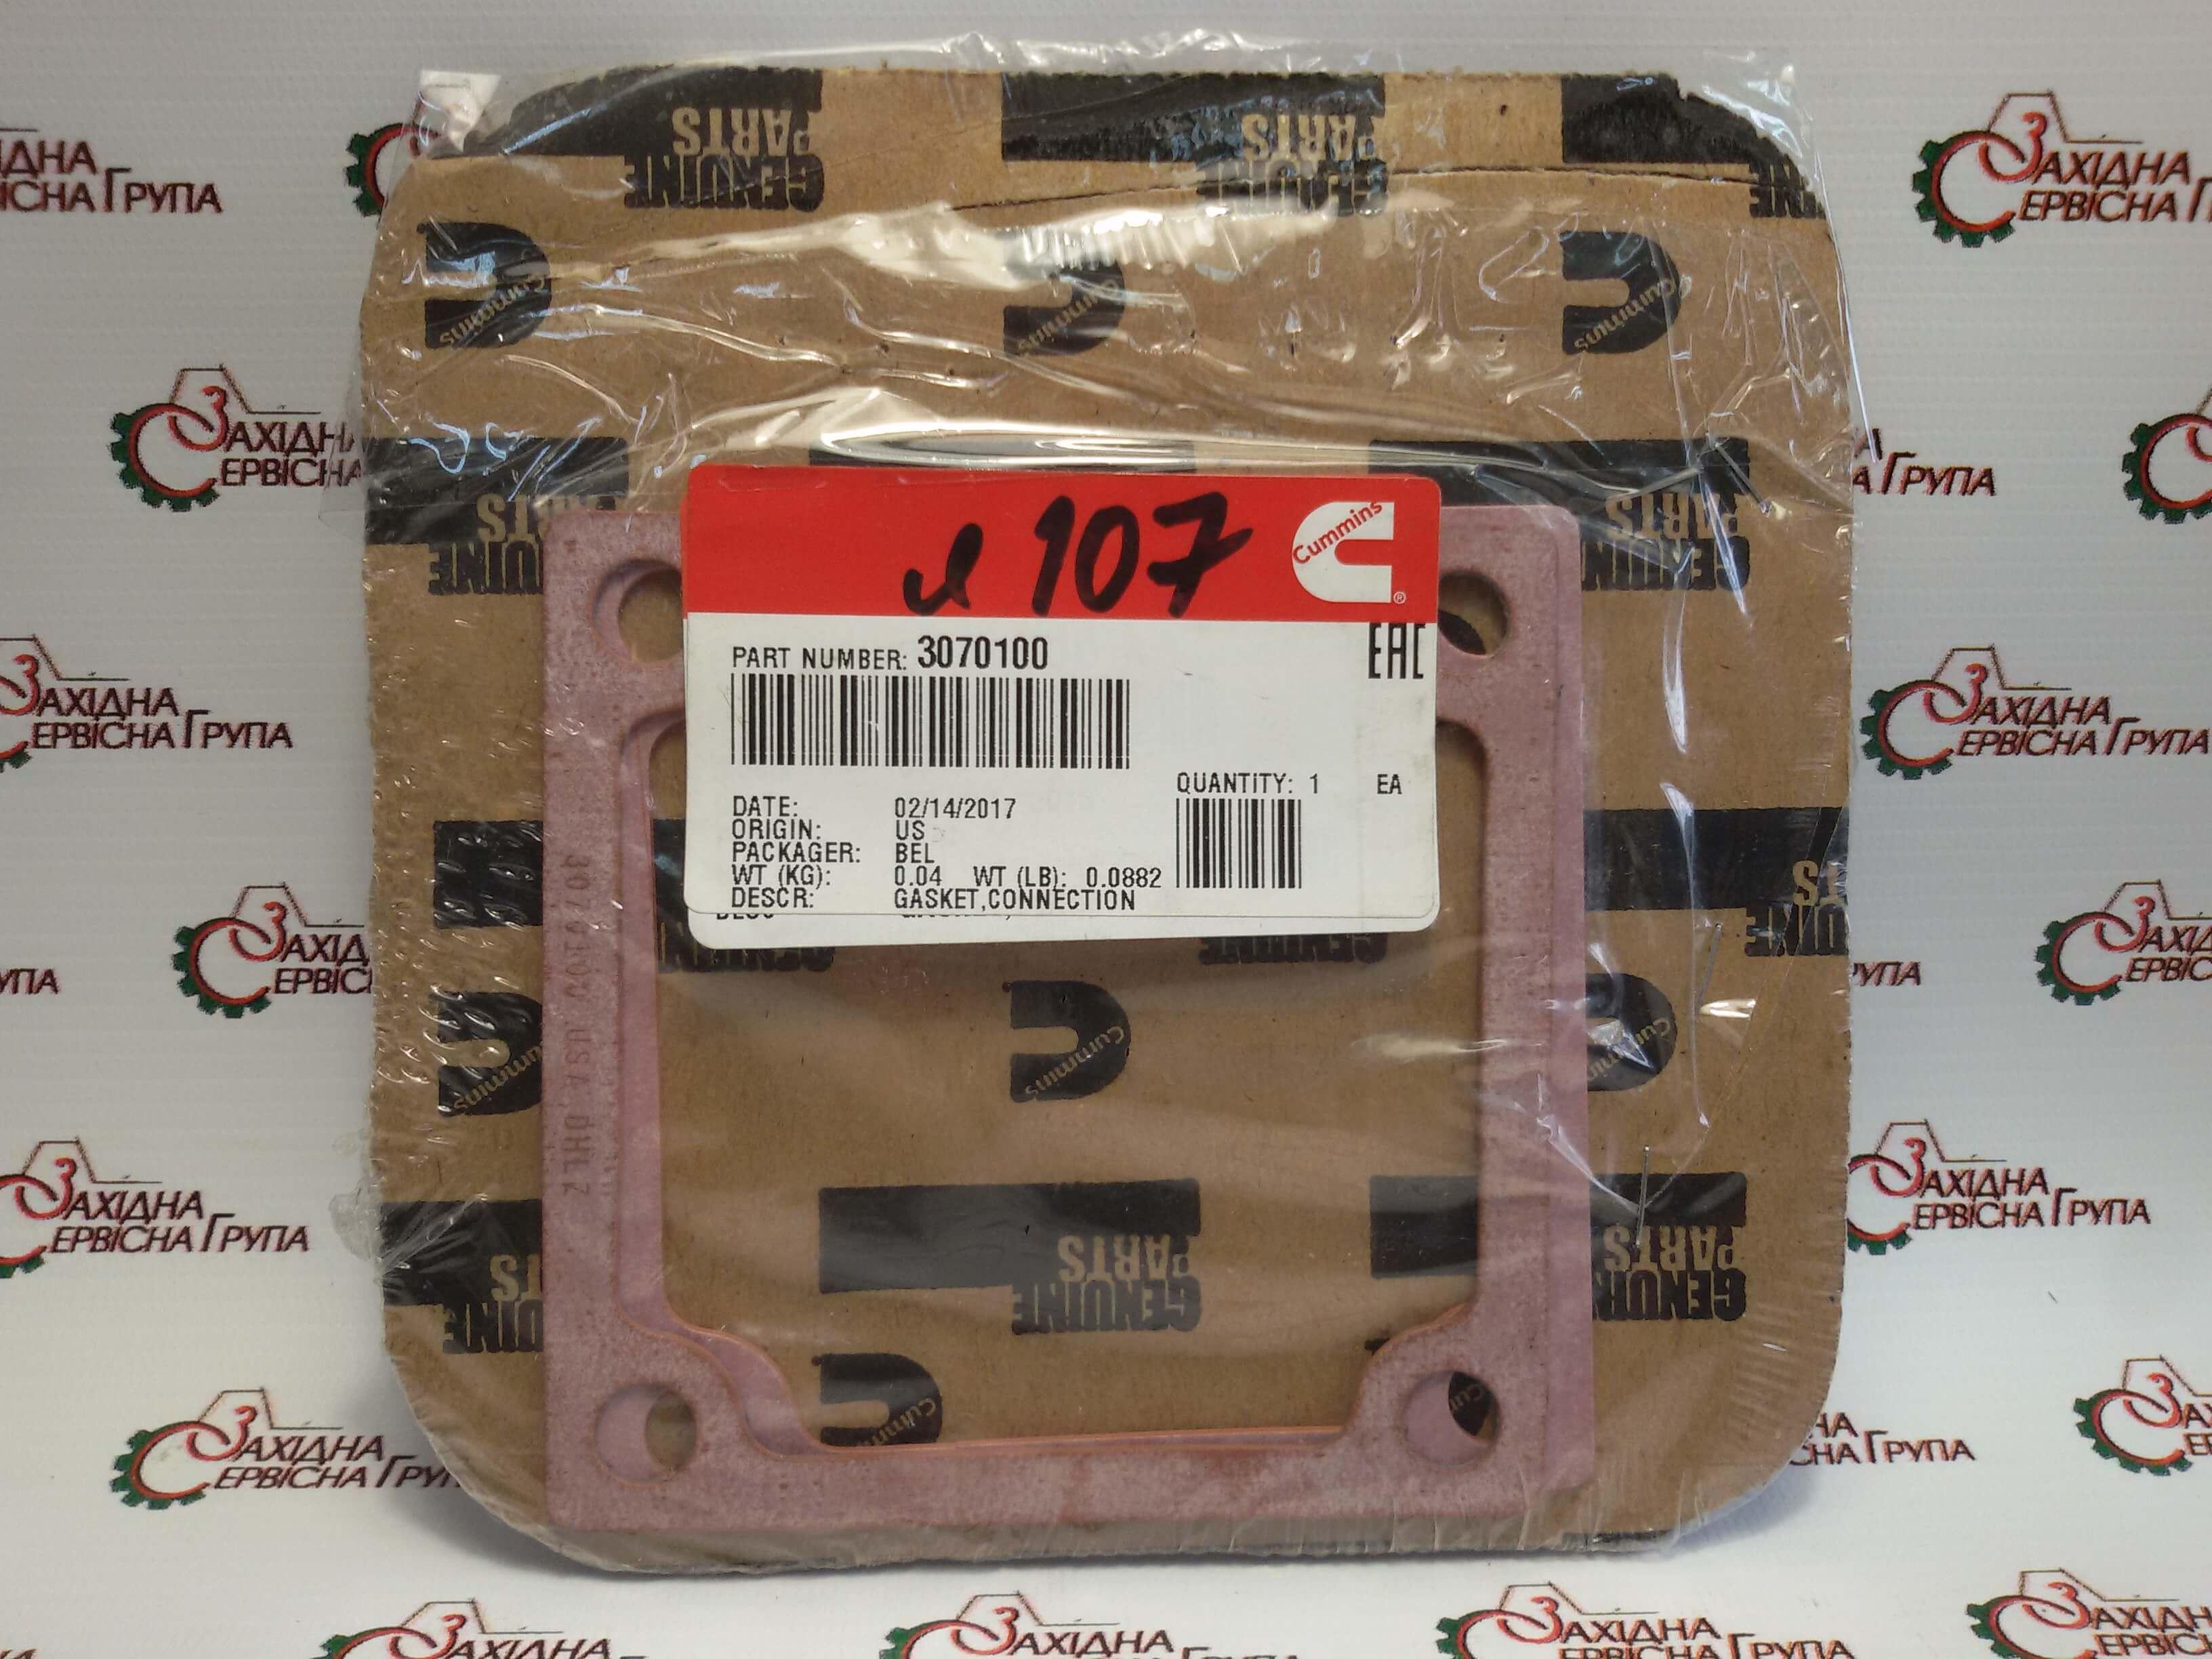 Прокладка впускного патрубка Cummins ISM11, QSM11, 3070100.